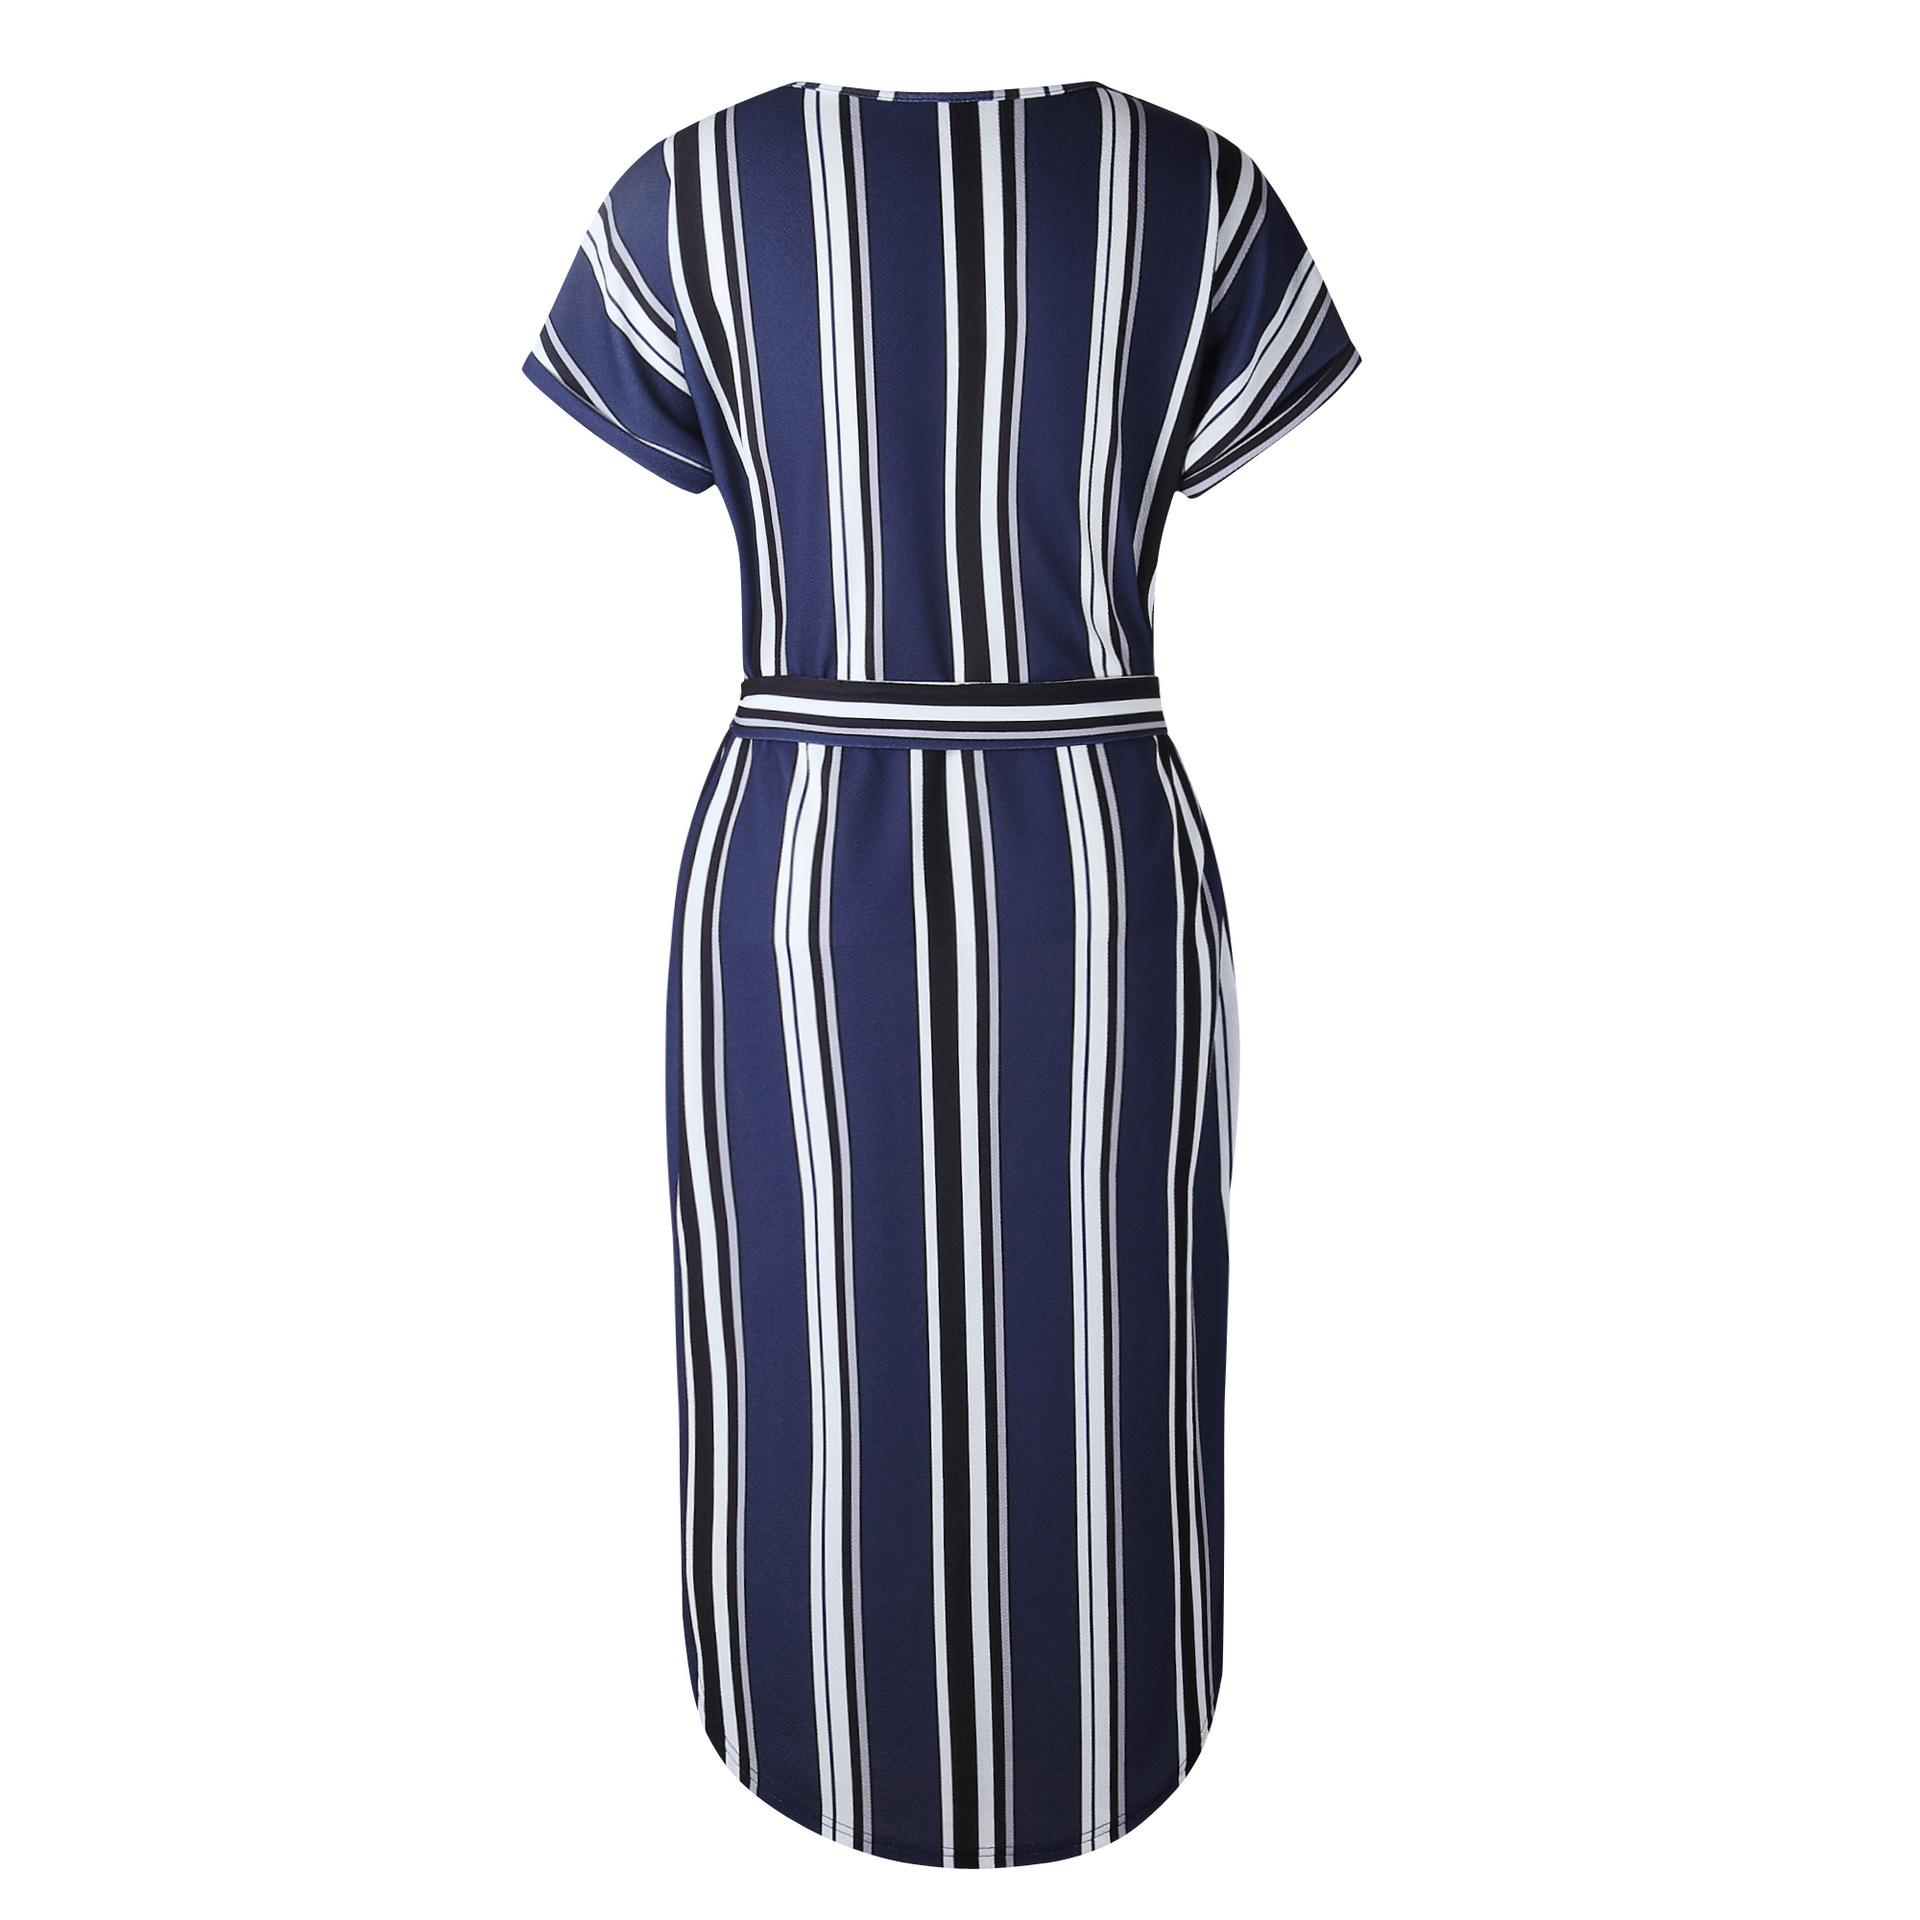 2018 Summer Dress Women Print V Neck Short Sleeve Robe Female Dresses Casual Sashes Midi Dress Ladies Elegant Vestidos Dropship 36